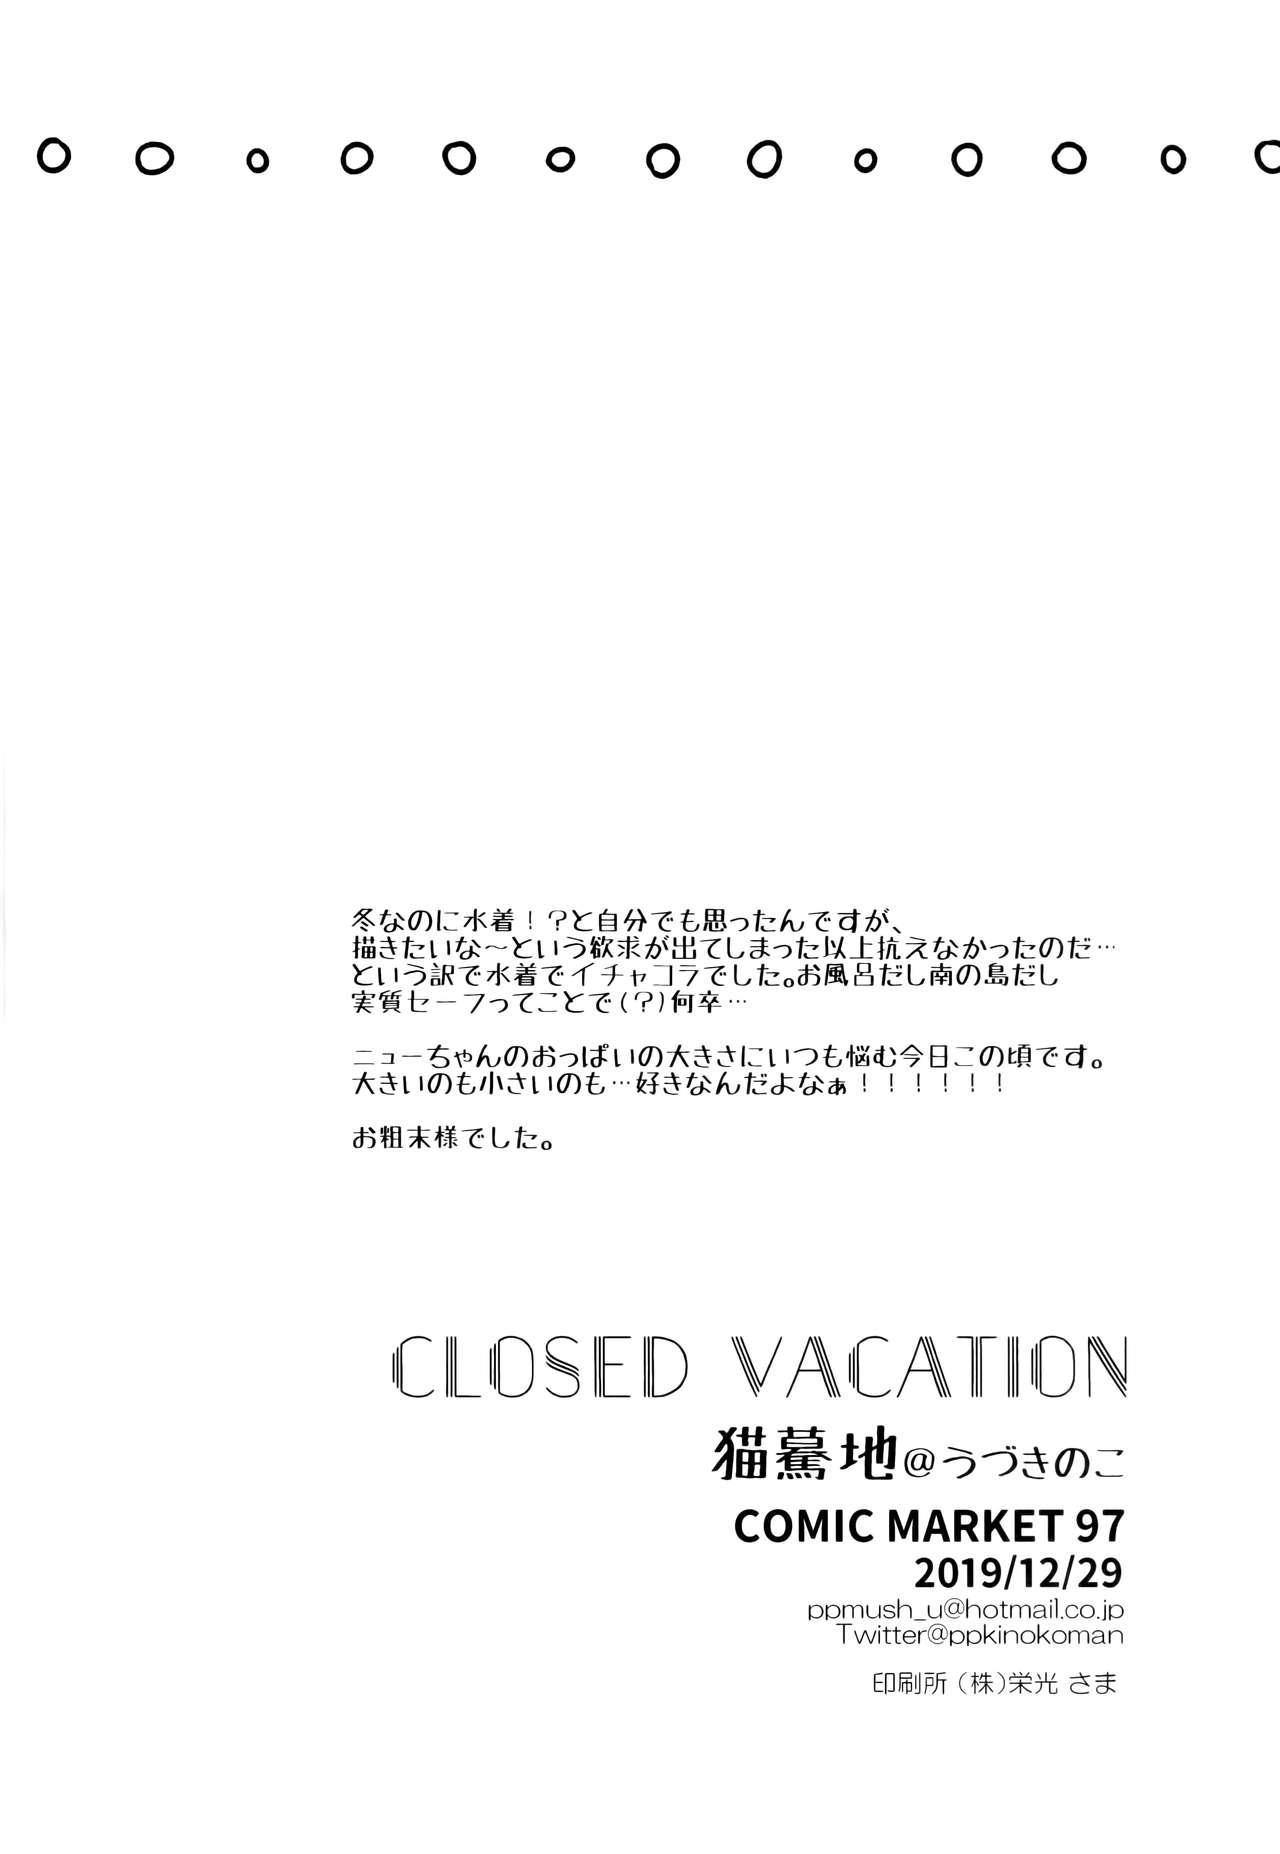 CLOSED VACATION 26